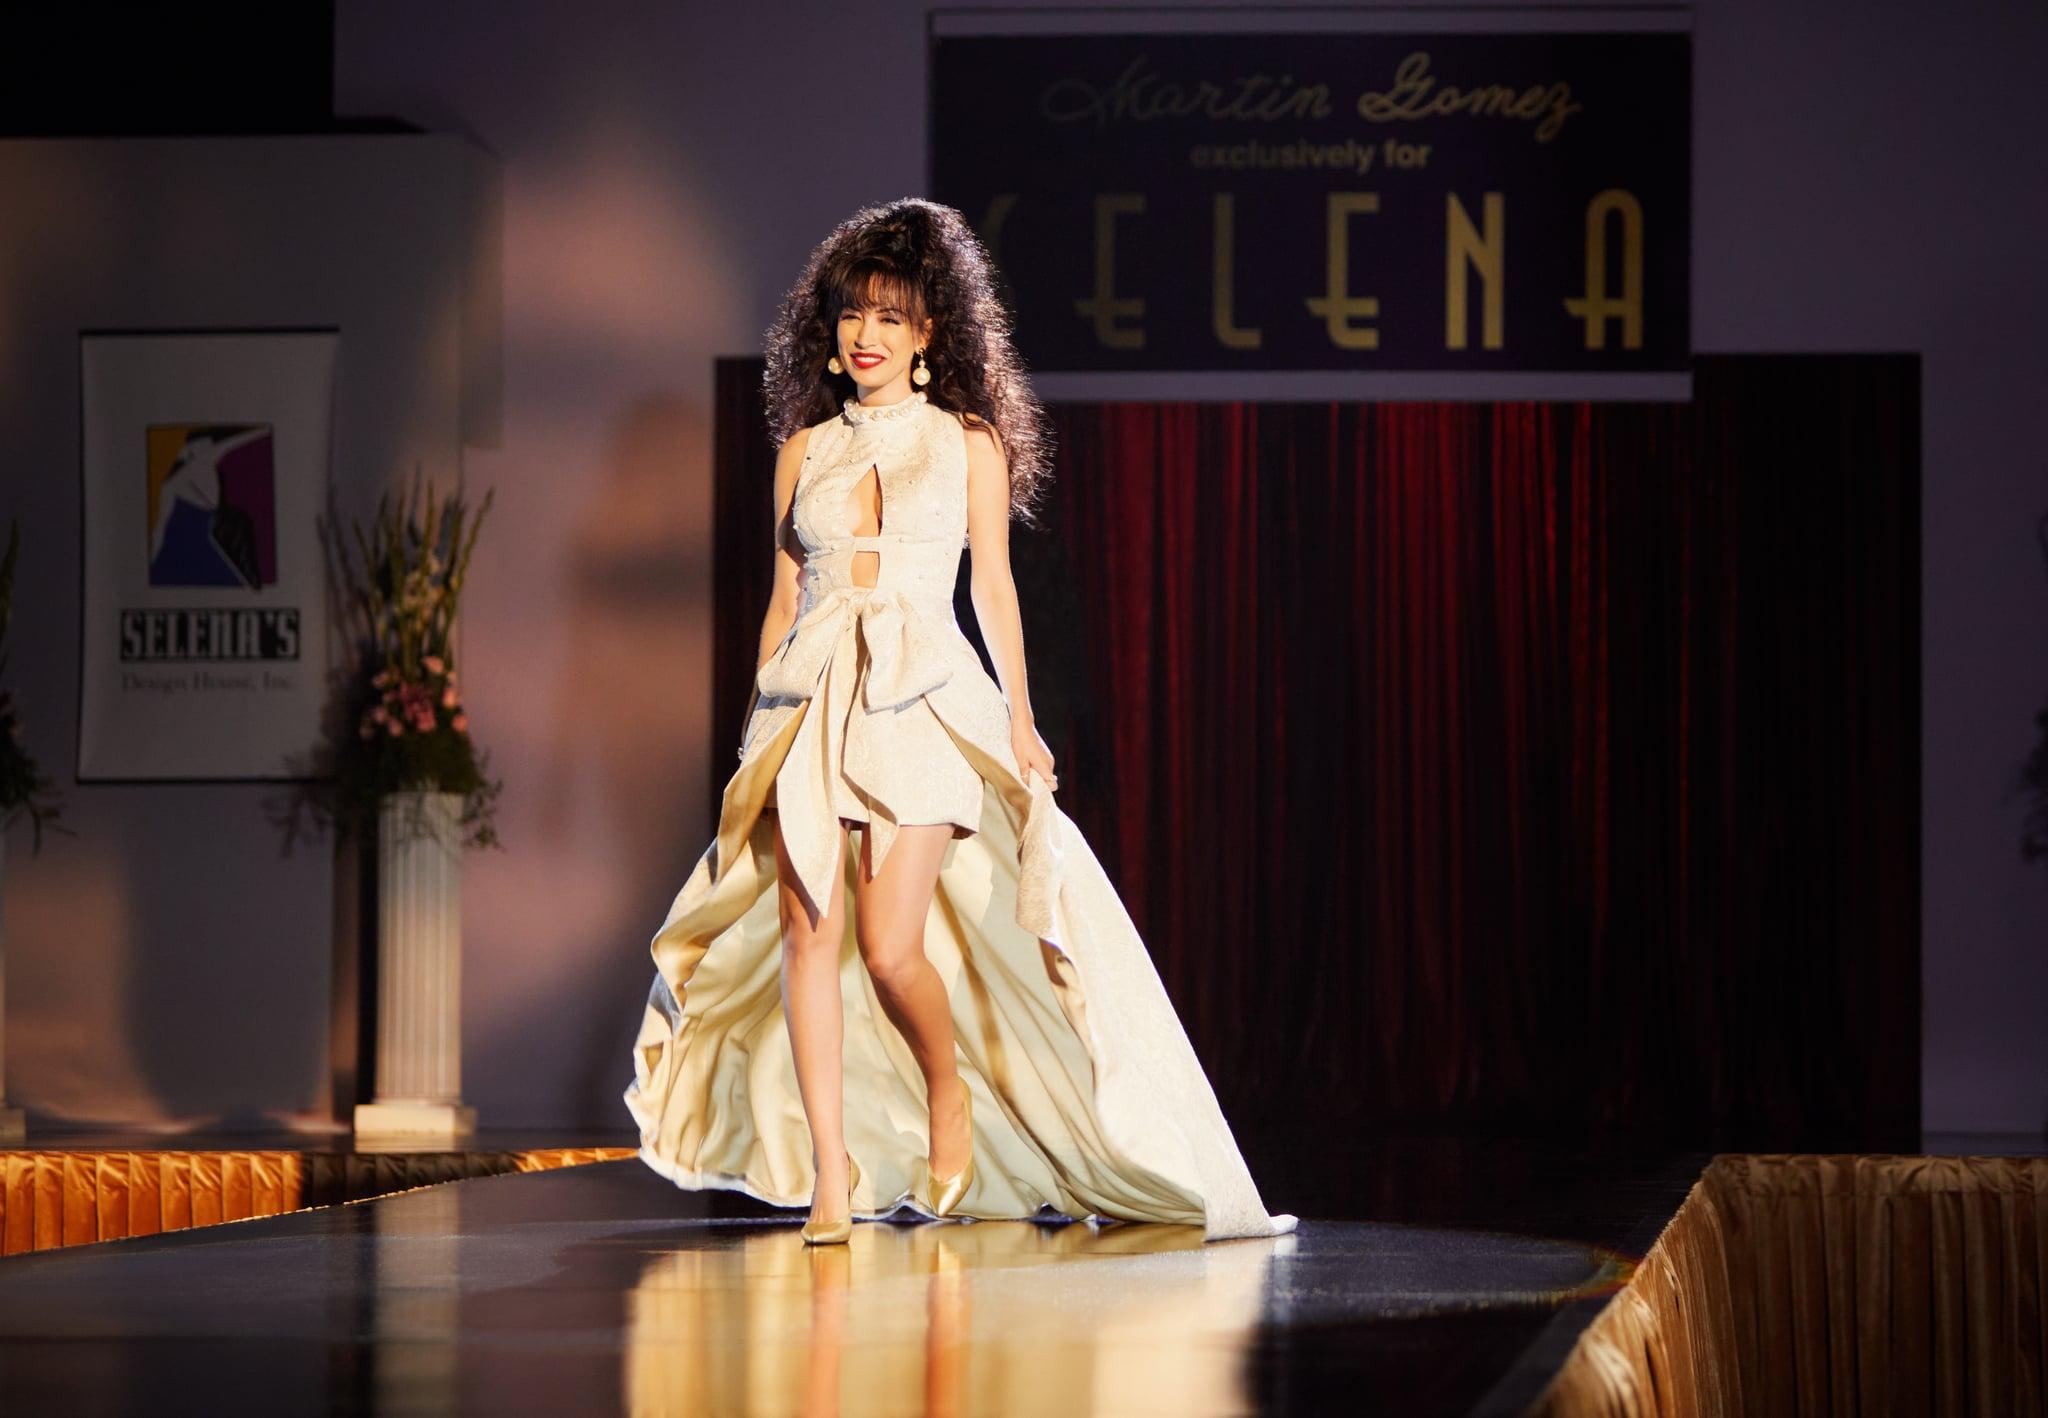 SELENA LA SERIE - Temporada 2 (L to R) CHRISTIAN SERRATOS as SELENA QUINTANILLA in Episode 207 of SELENA LA SERIE Temporada 2. Cr. SARA KHALID/NETFLIX ©️ 2021